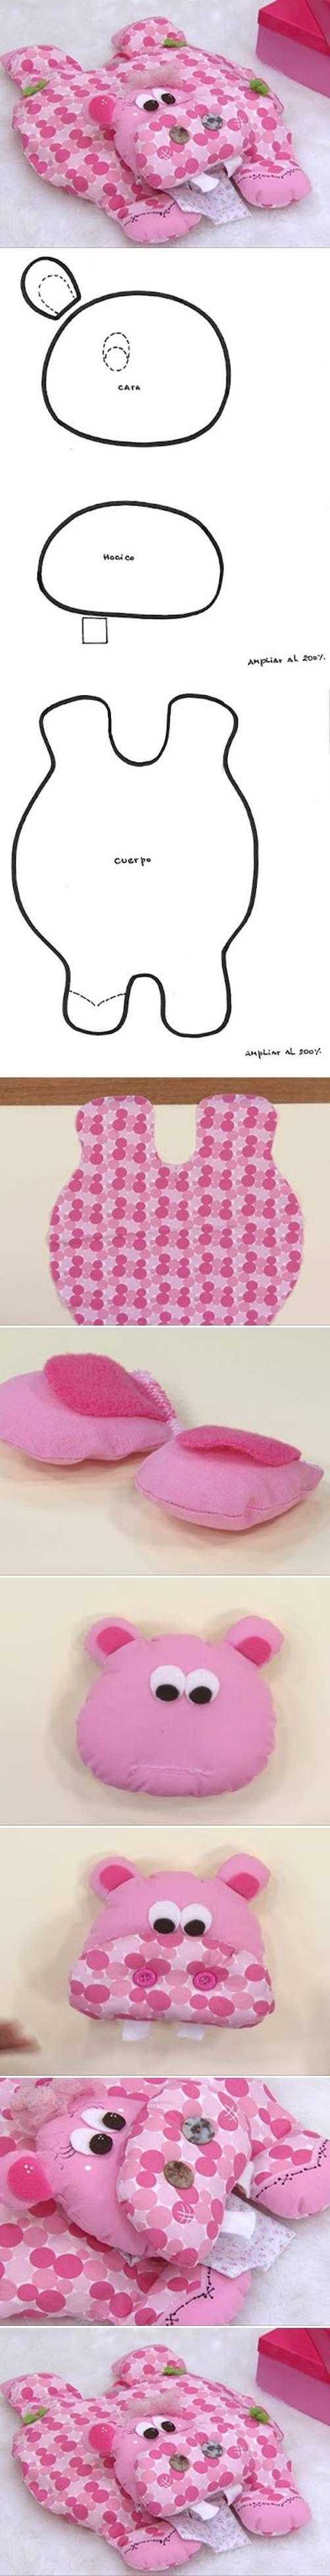 DIY Hippo Pillow DIY Projects | UsefulDIY.com